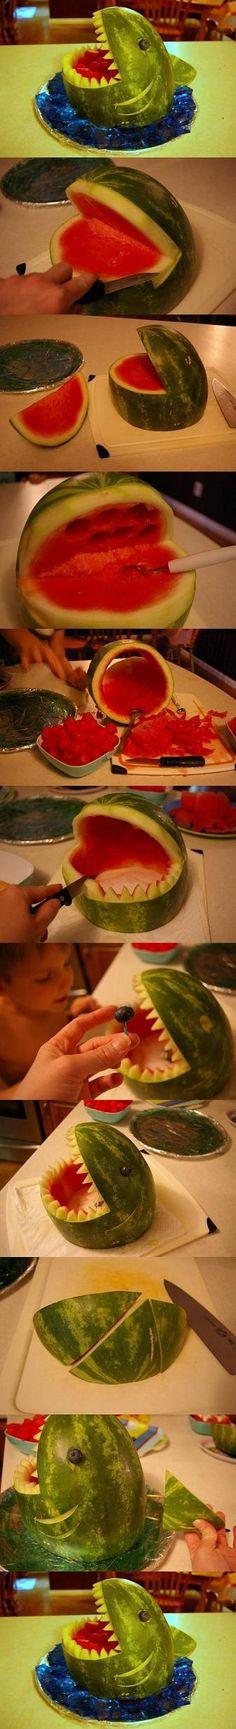 DIY Watermelon Shark Carving Internet Tutorial DIY Projects | UsefulDIY.com